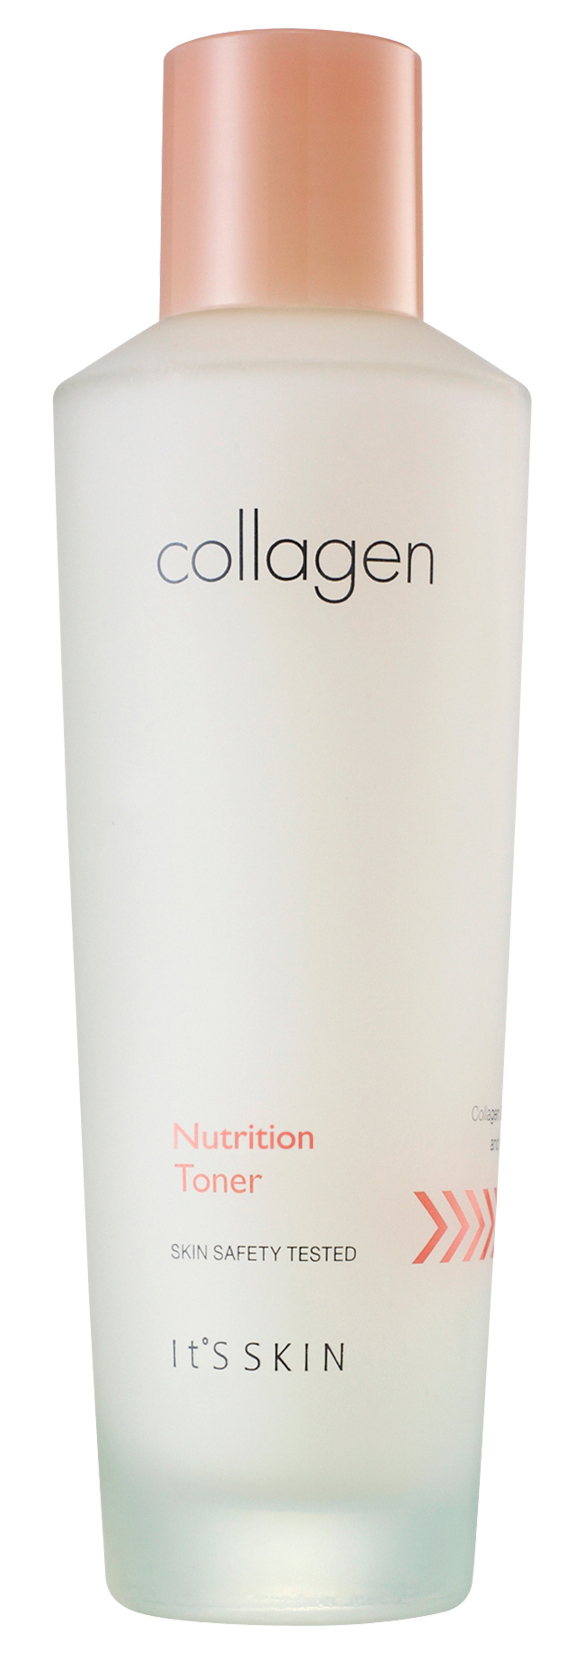 It'S SKIN Тонер питательный Коллаген / Collagen Nutrition Toner 150 мл